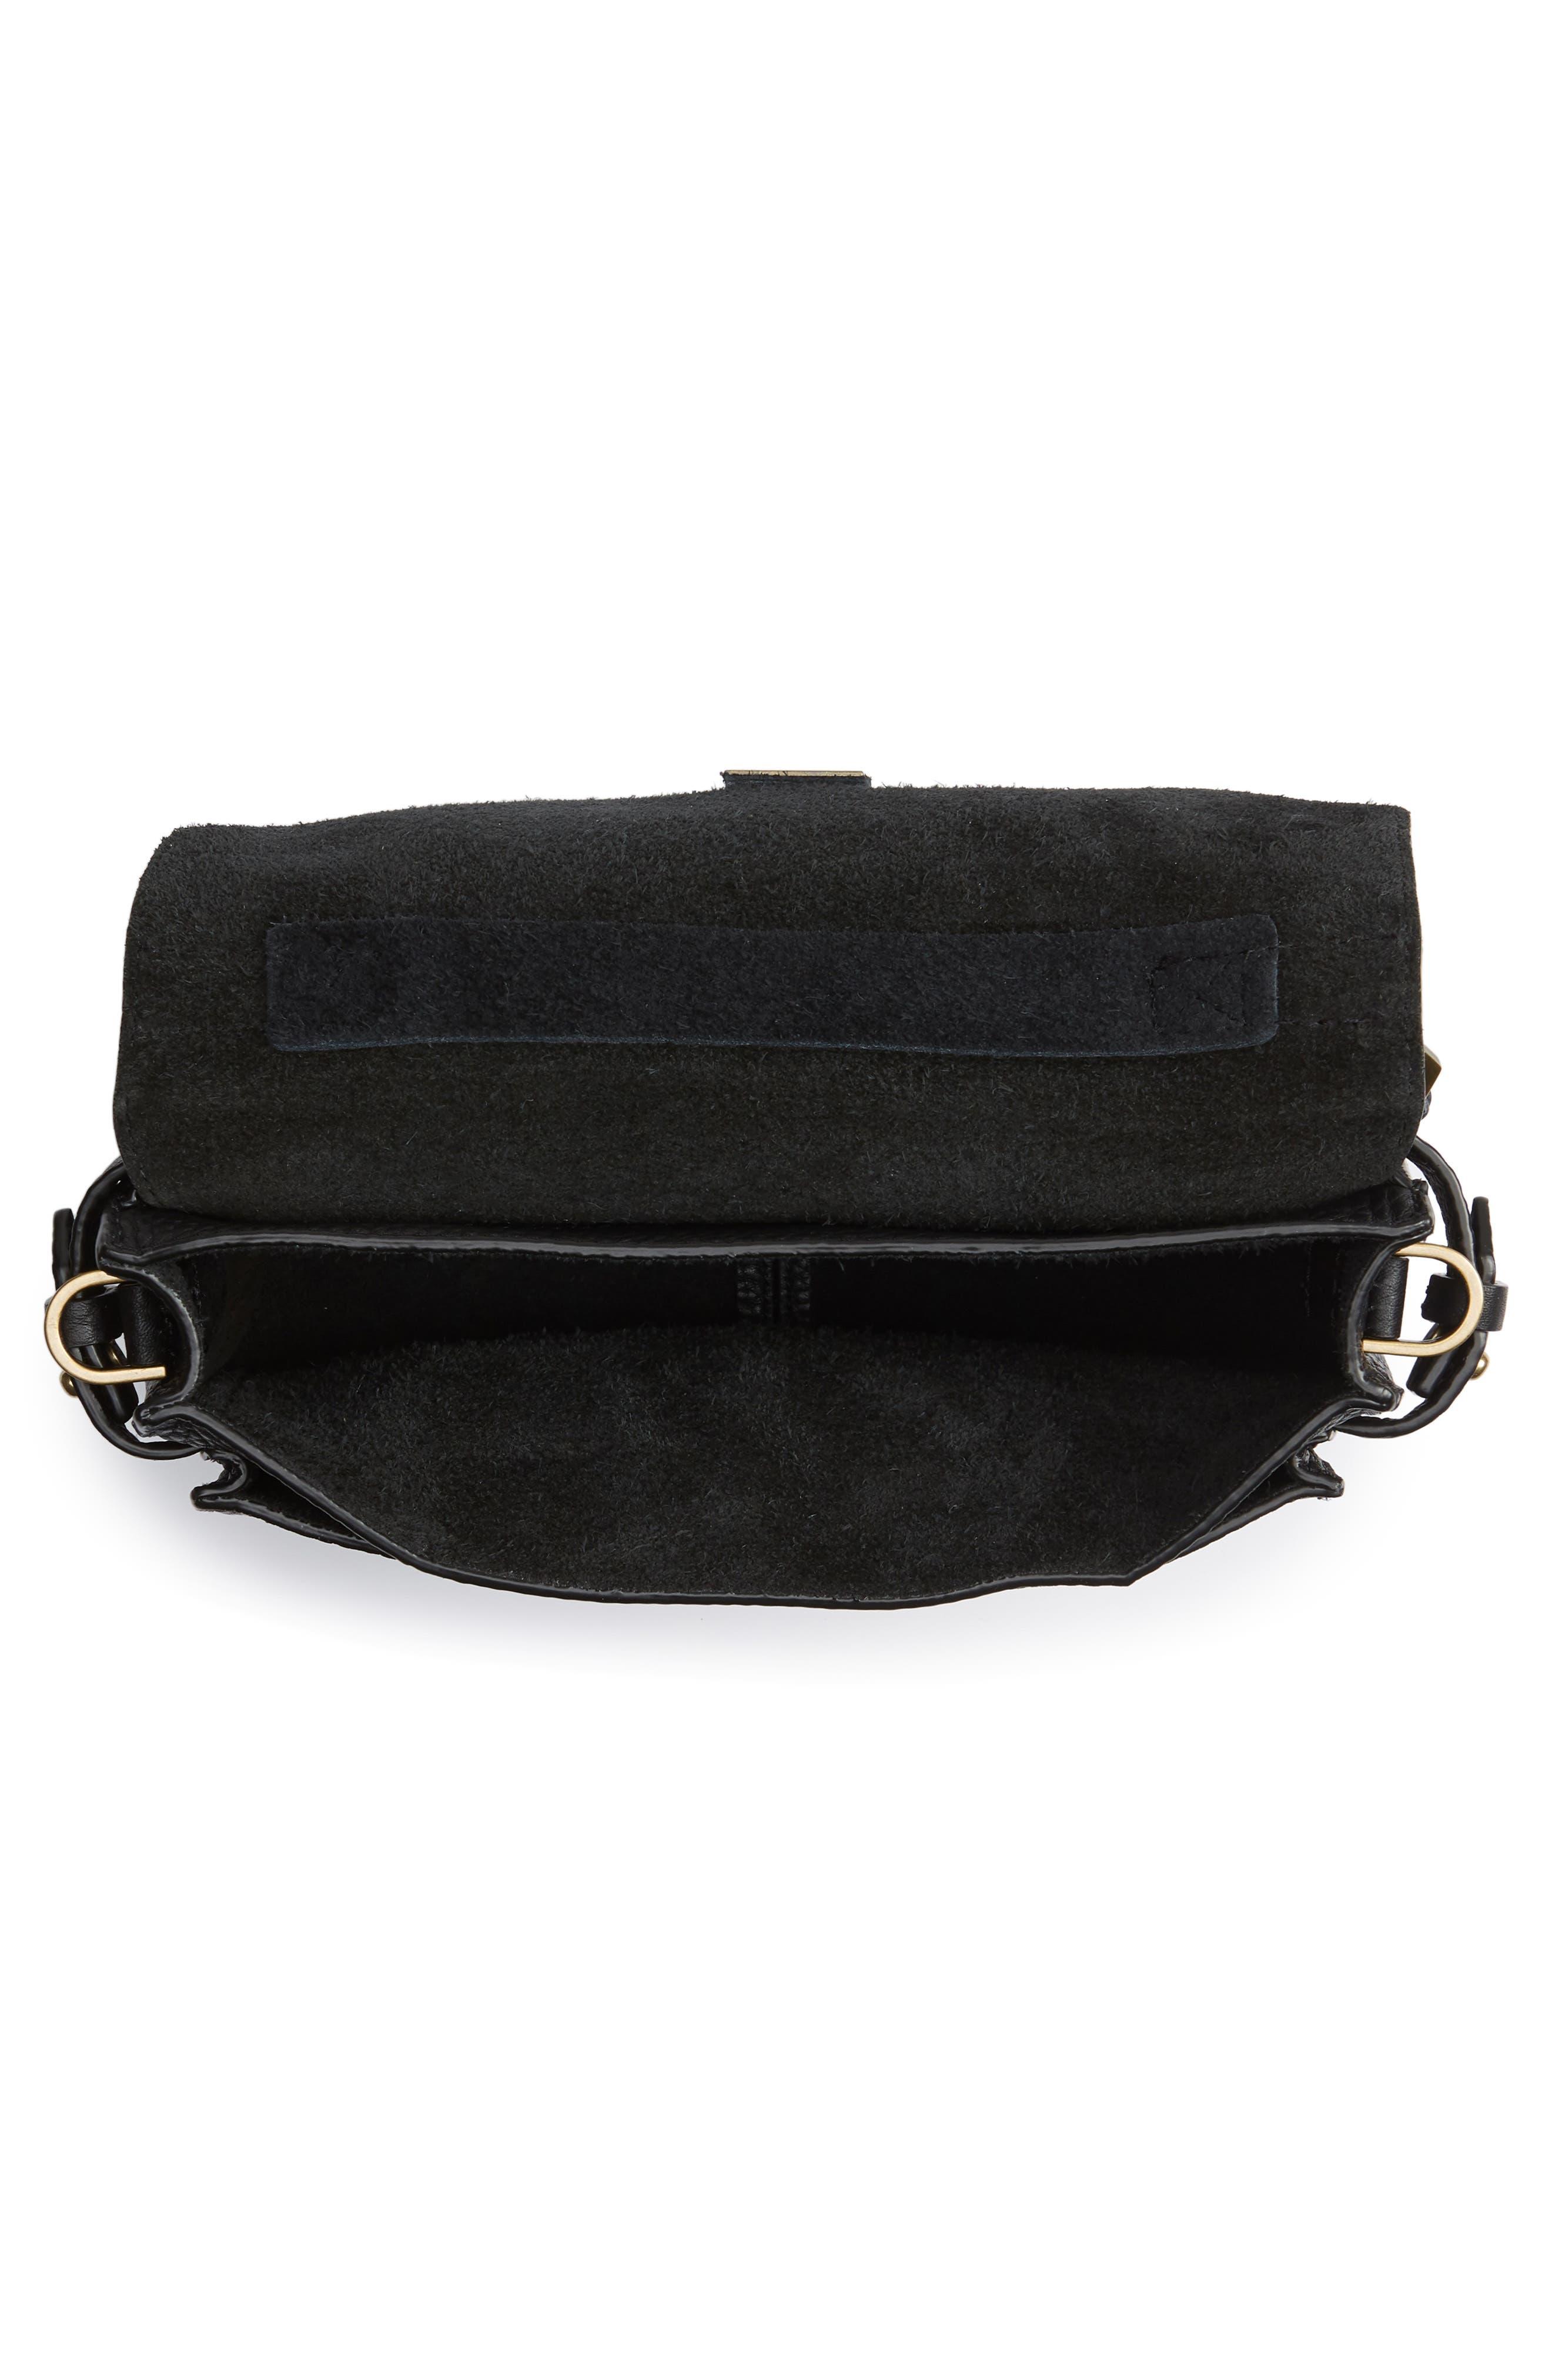 REBECCA MINKOFF, 'Small Darren' Leather Messenger Bag, Alternate thumbnail 4, color, BLACK